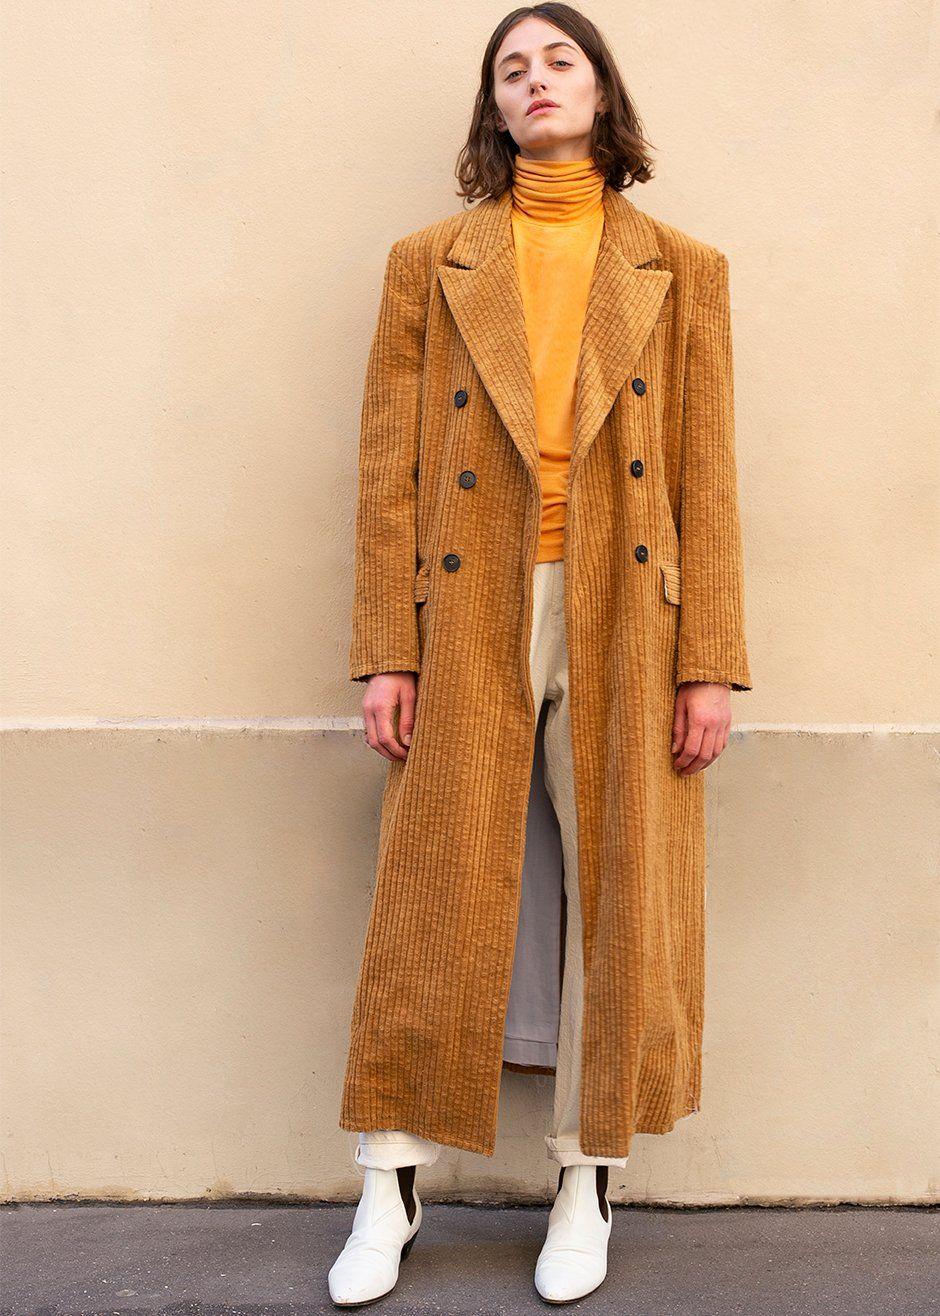 4ec35b78d5c443 Amber Wide Rib Corduroy Long Coat Top Coat, Corduroy, Coats For Women,  Double